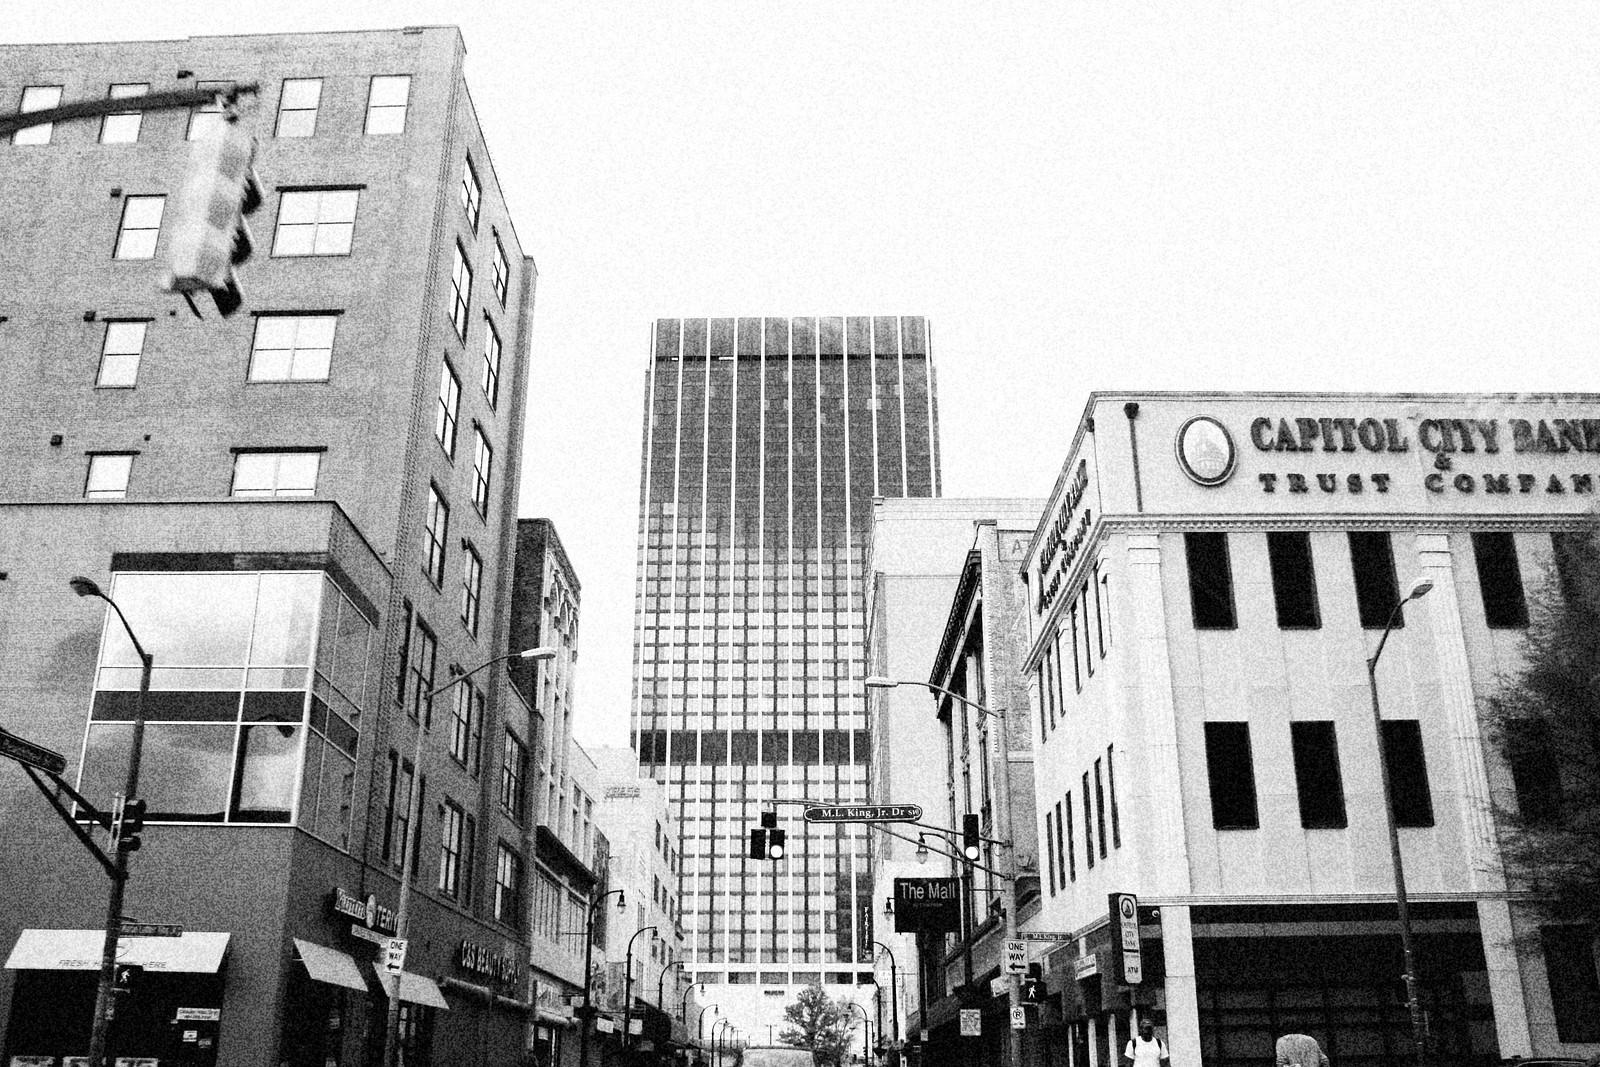 Capitol City Bank & Trust Company, Downtown Atlanta